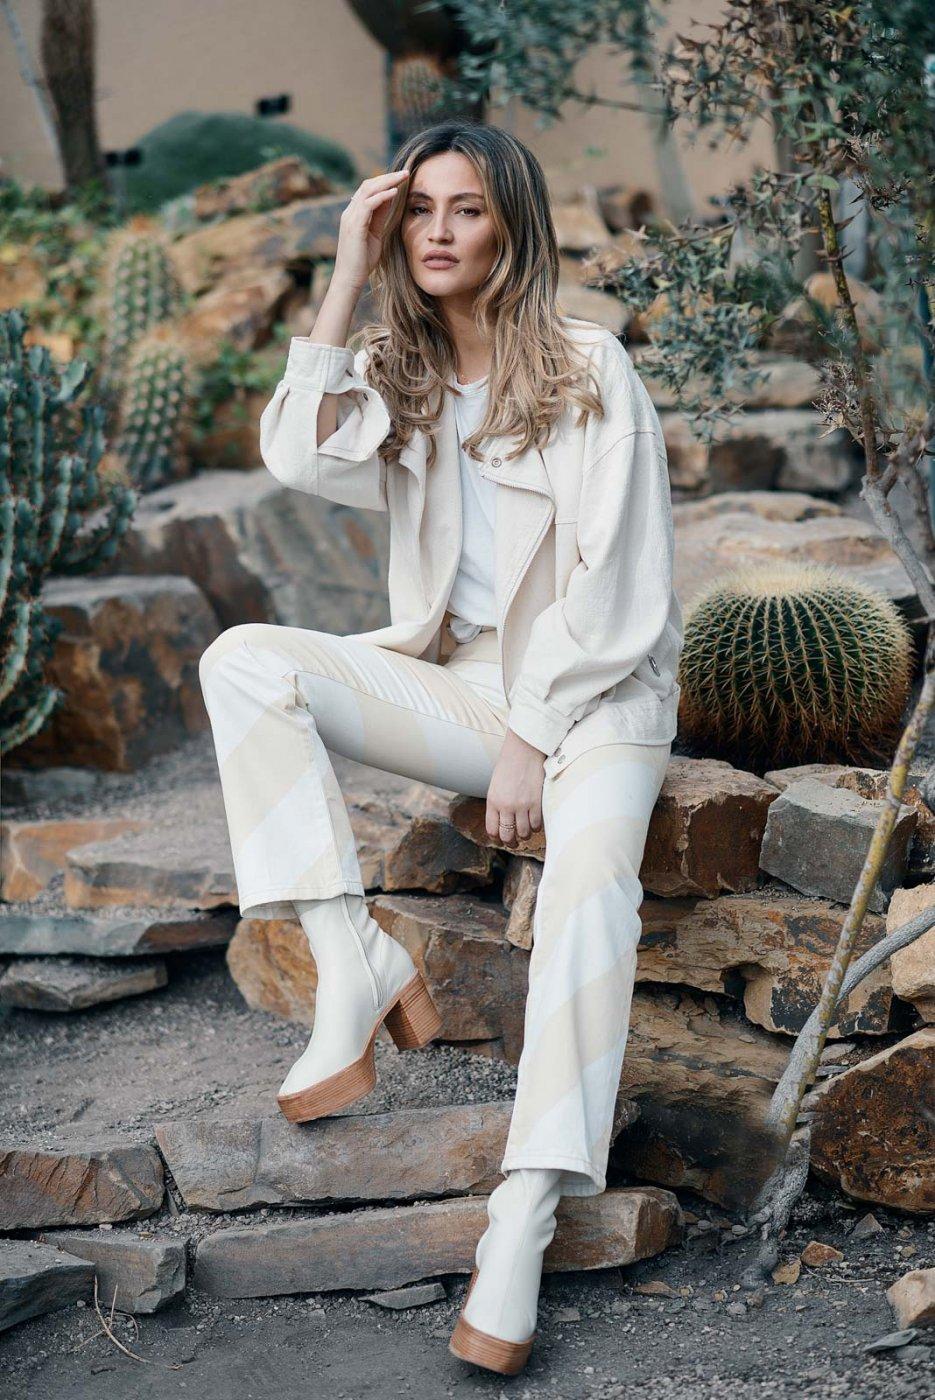 Fashion Portrait Photography By Anastasia Vervueren Lima's Wardrobe Plantentuin Meise